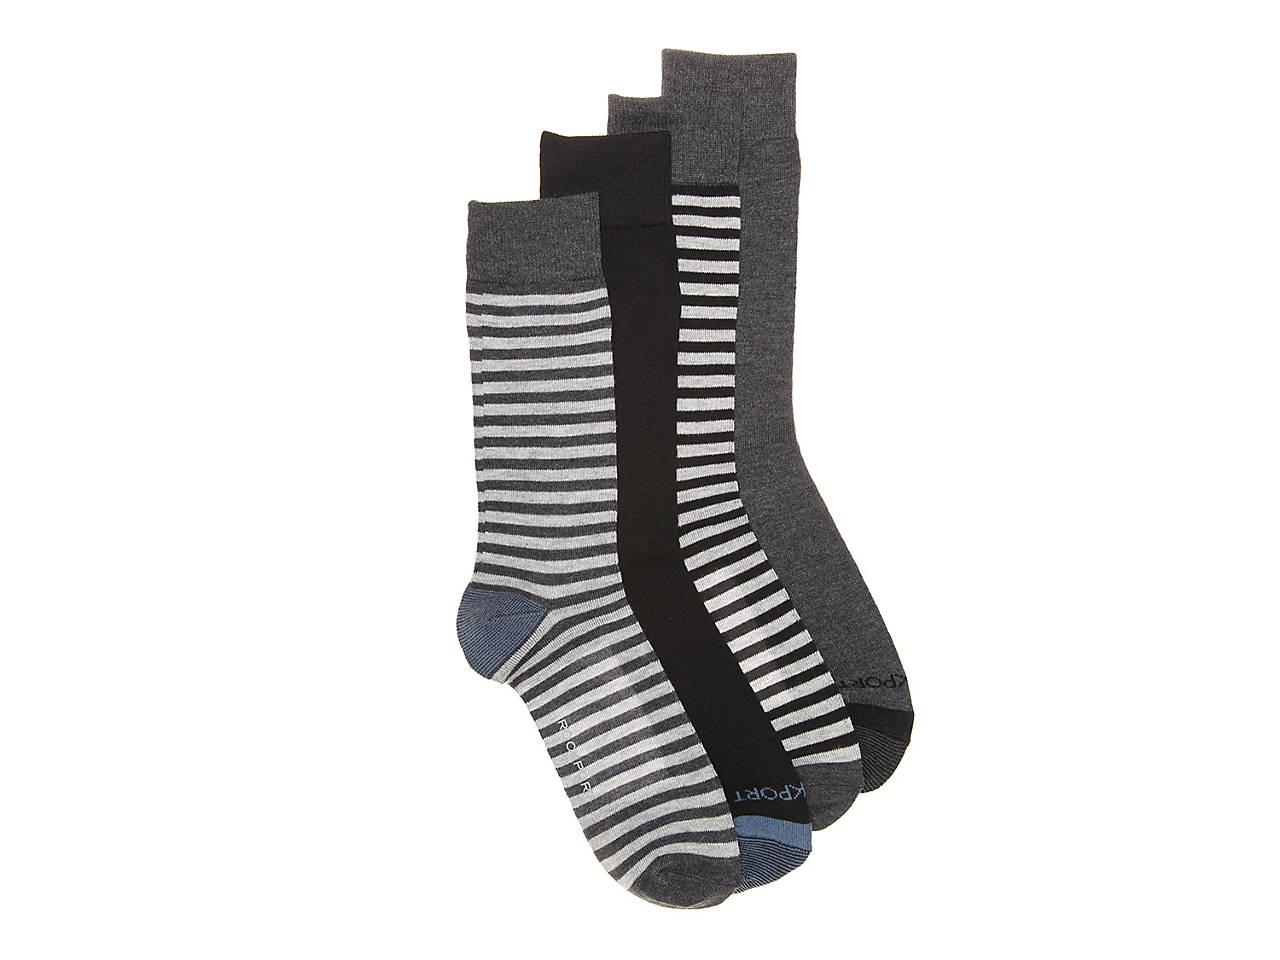 Stripe Men S Crew Socks 4 Pack